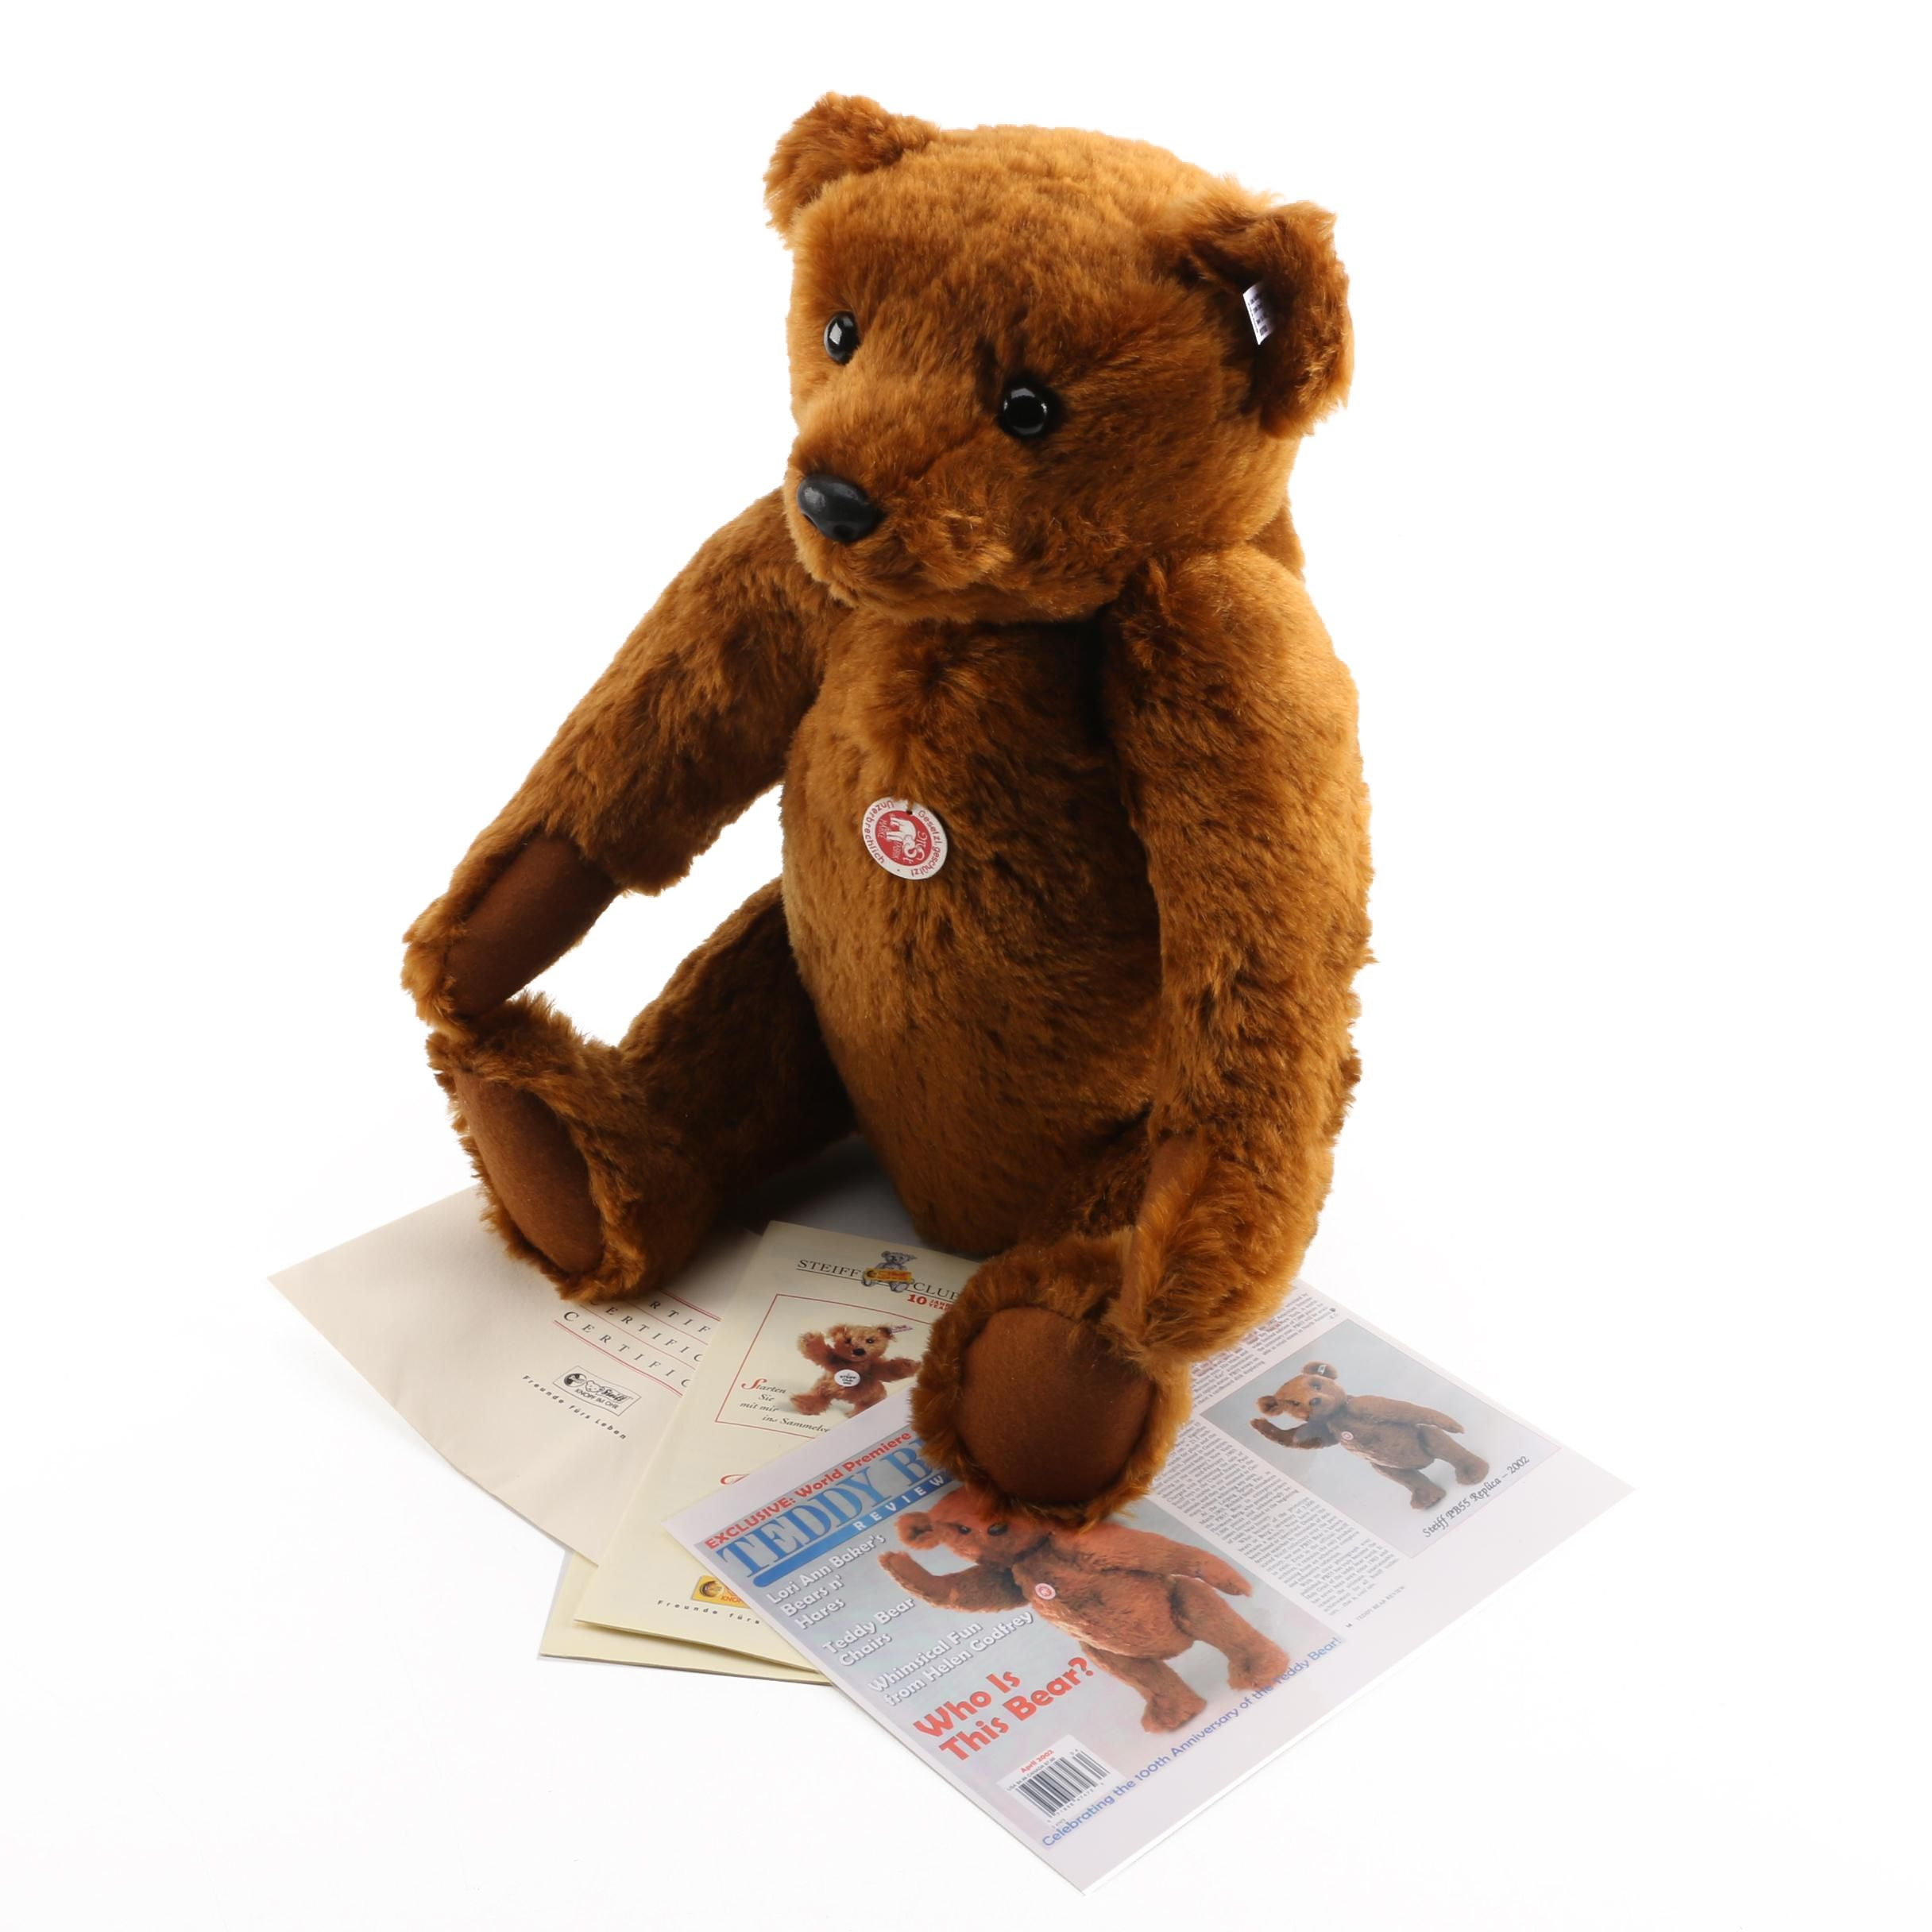 2002 Steiff 100th Anniversary Plush Teddy Bear